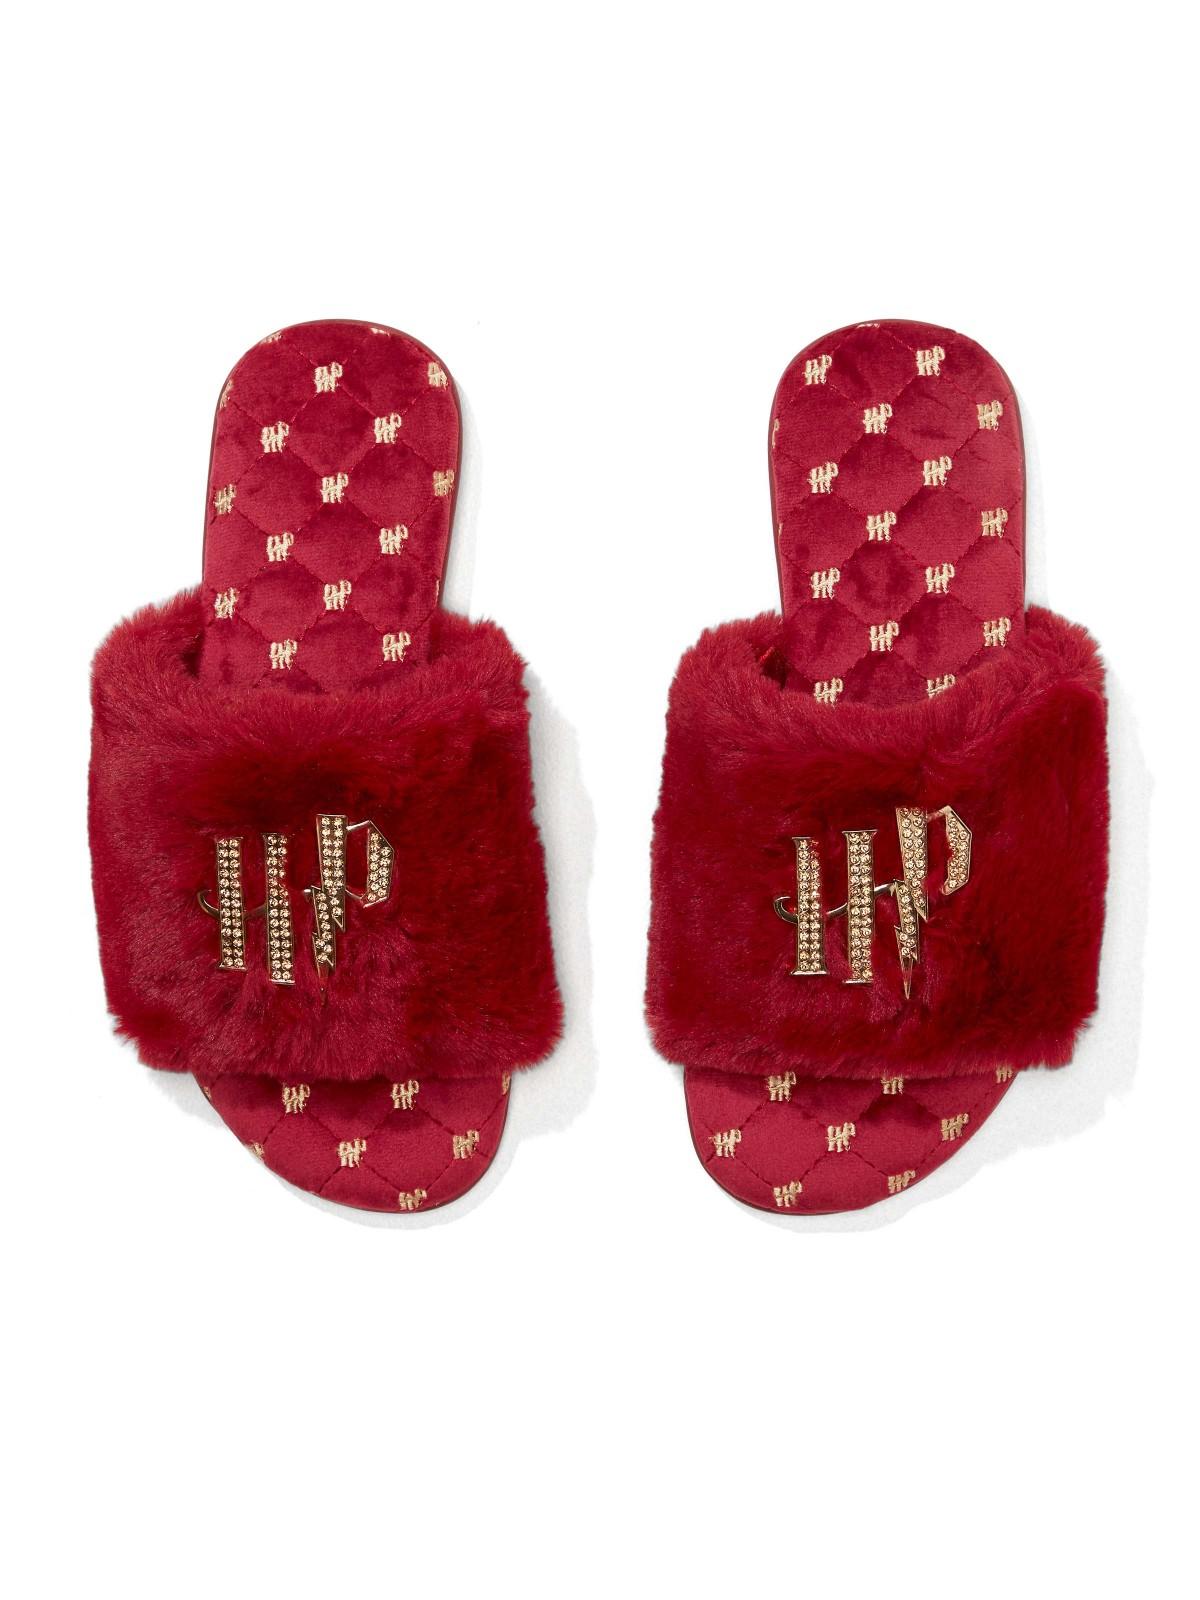 Peter Alexander slippers, top view